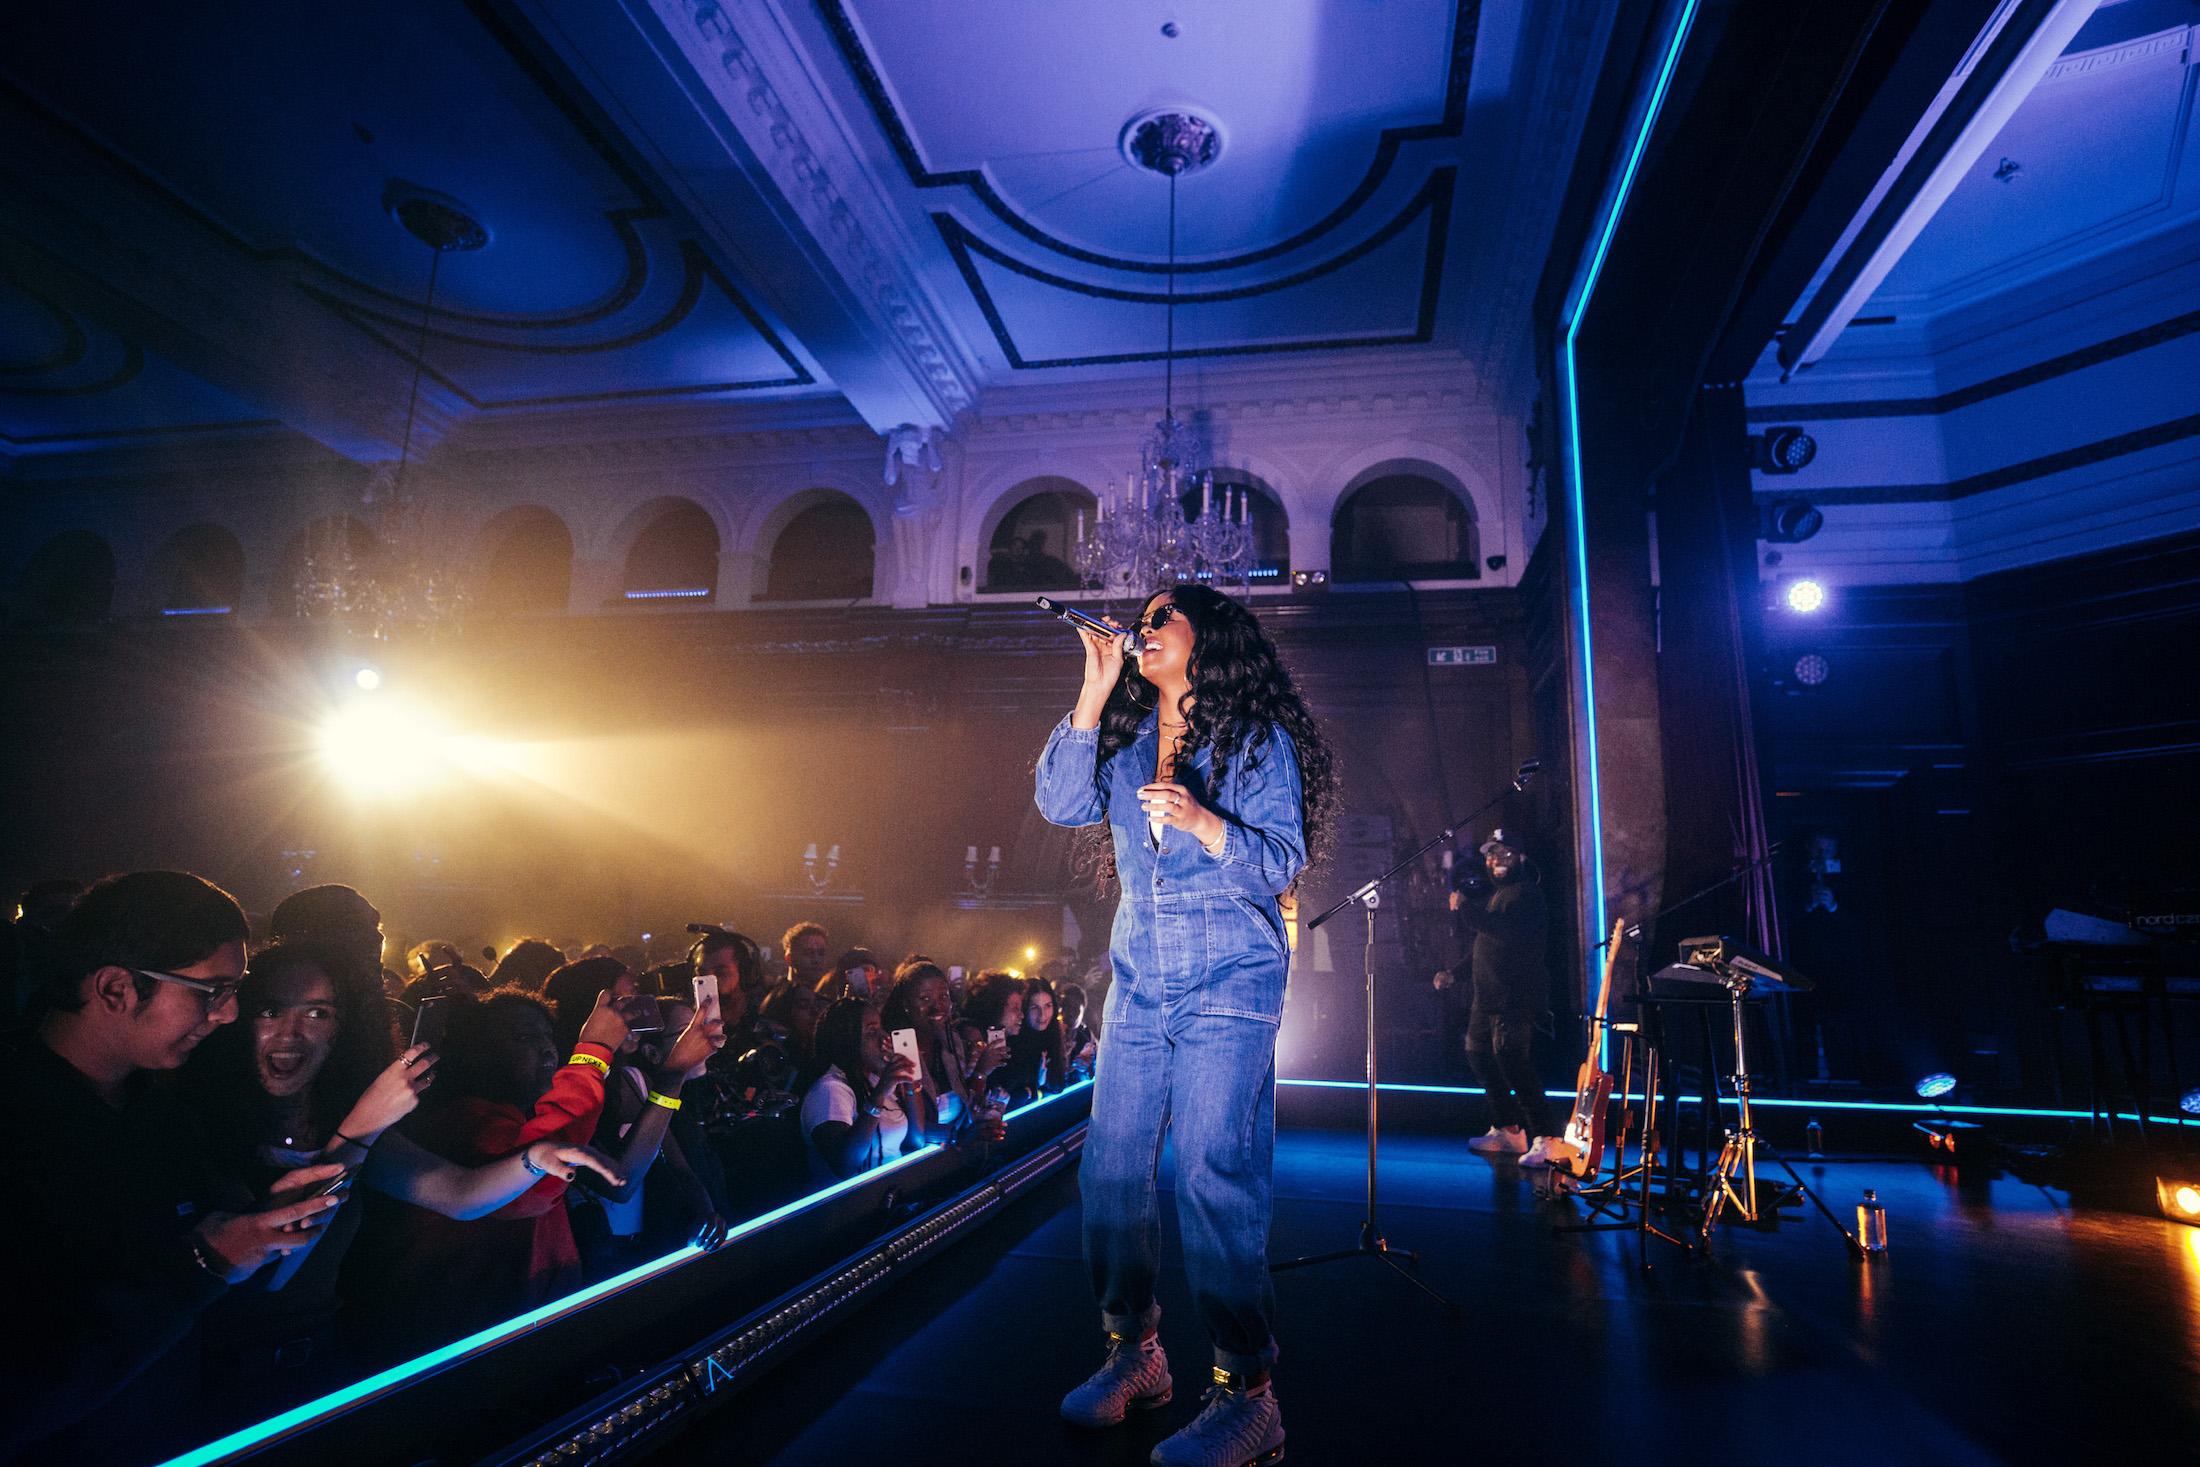 R&B musician H.E.R. in London in 2018